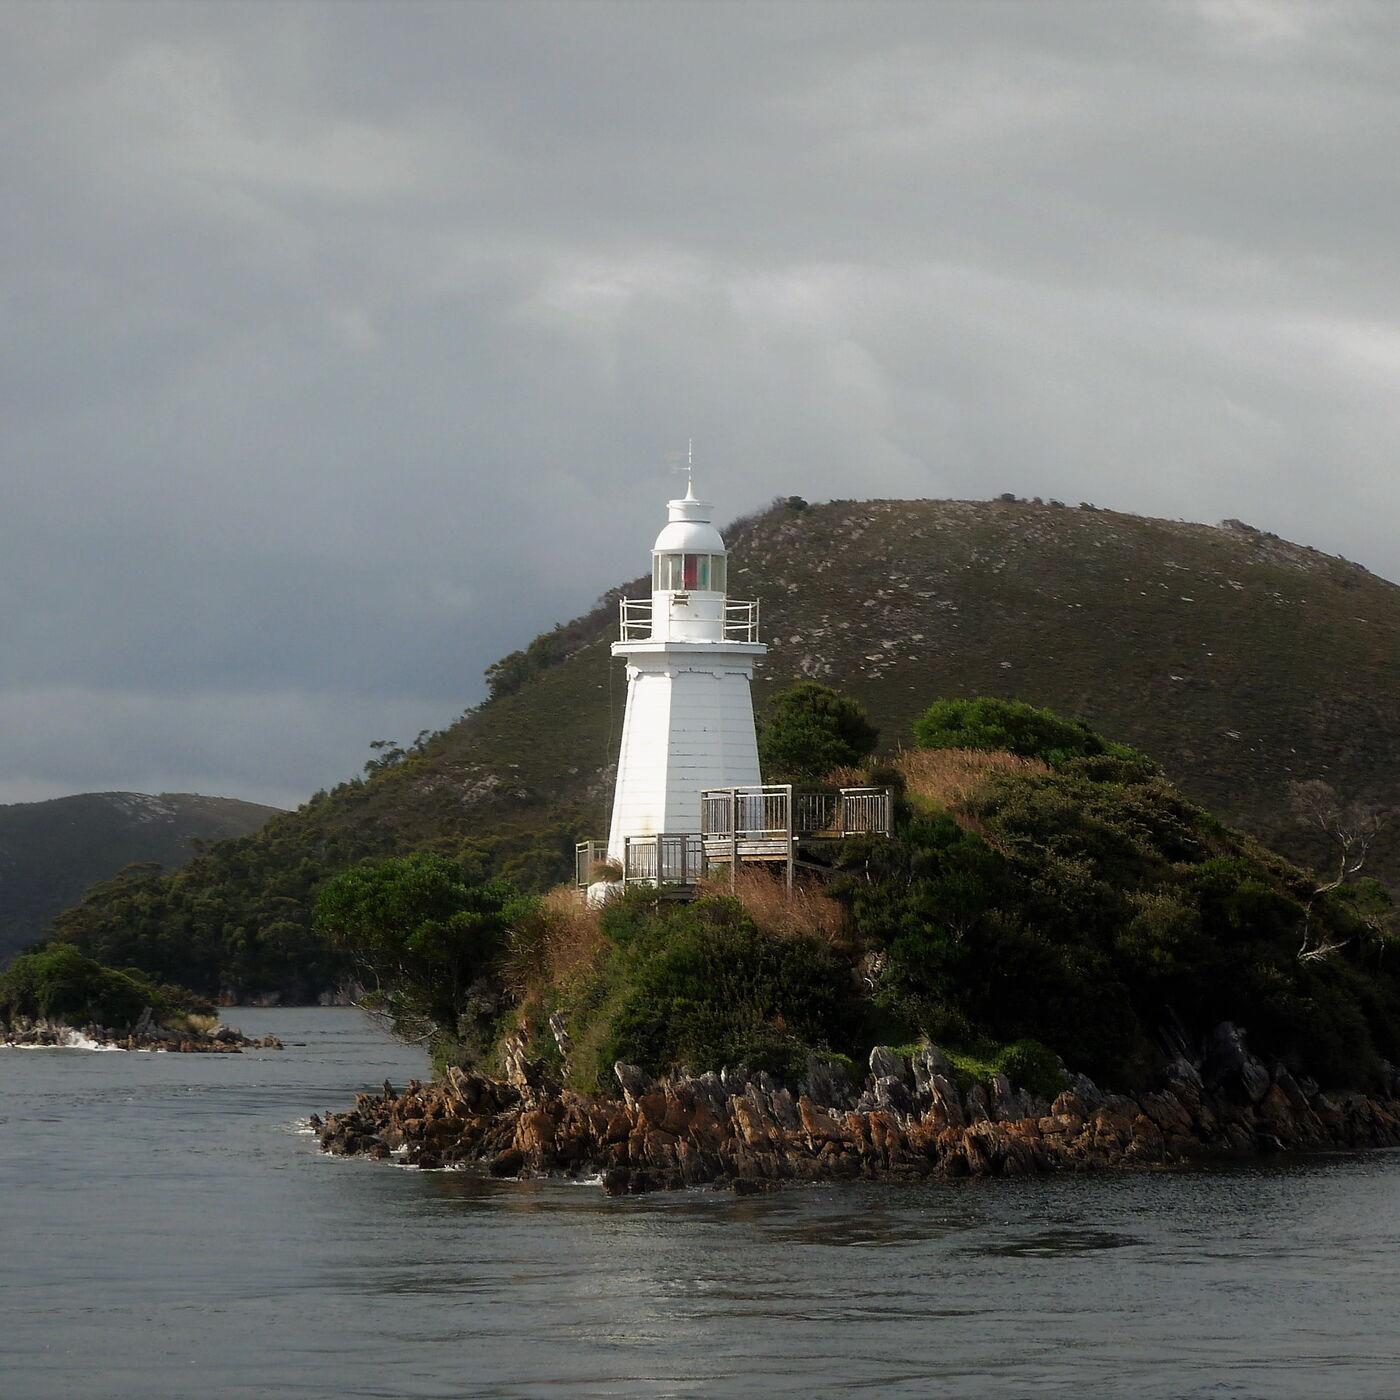 Episode 60: Miraculous Marine Life in Macquarie Harbour